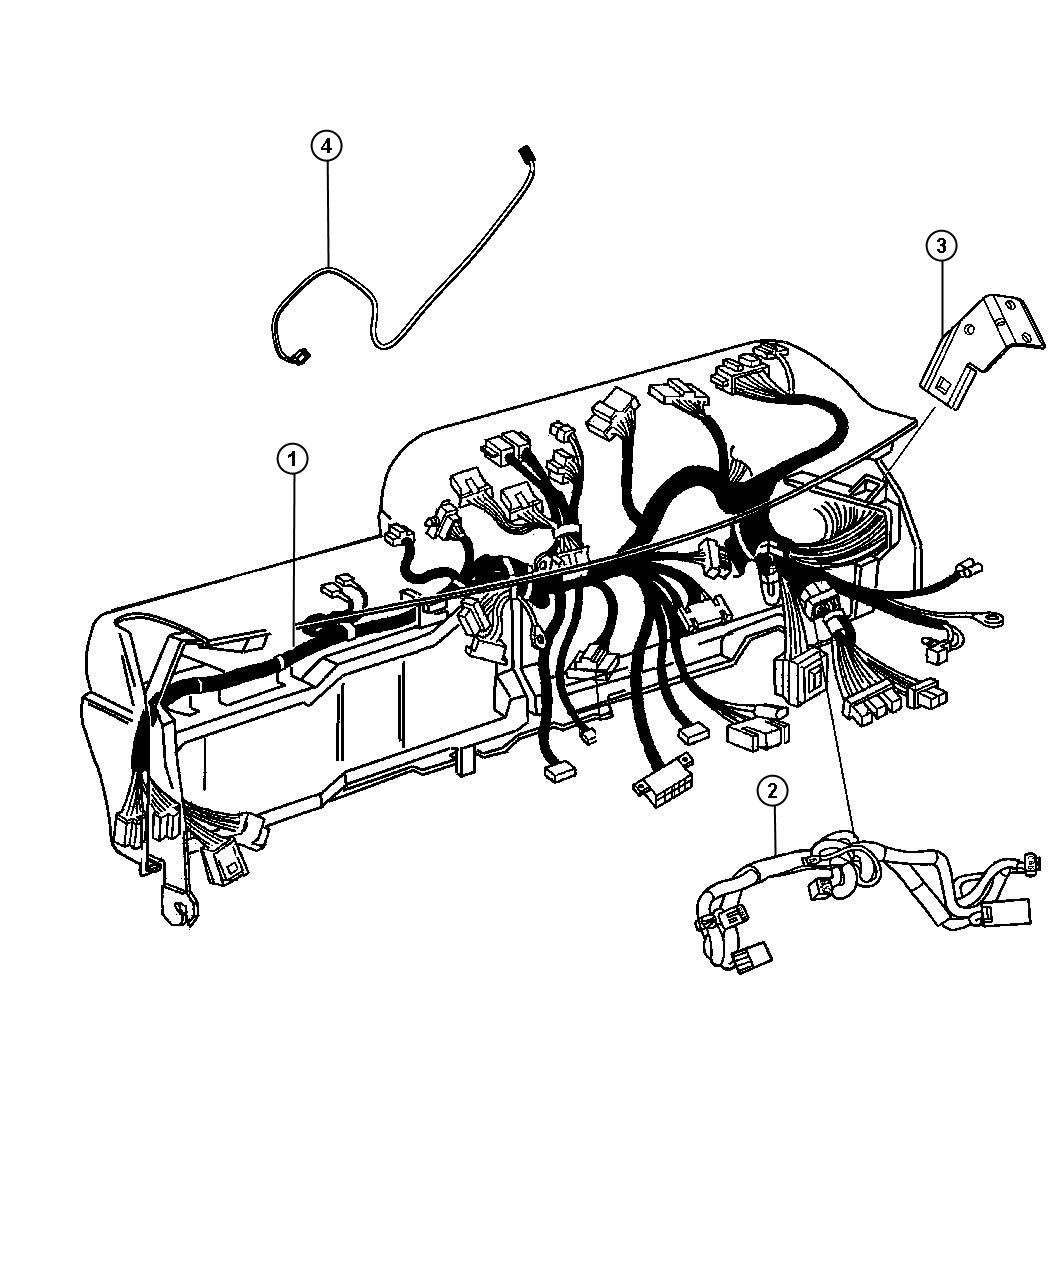 Ram 4500 Wiring  Instrument Panel   Air Conditioning    6